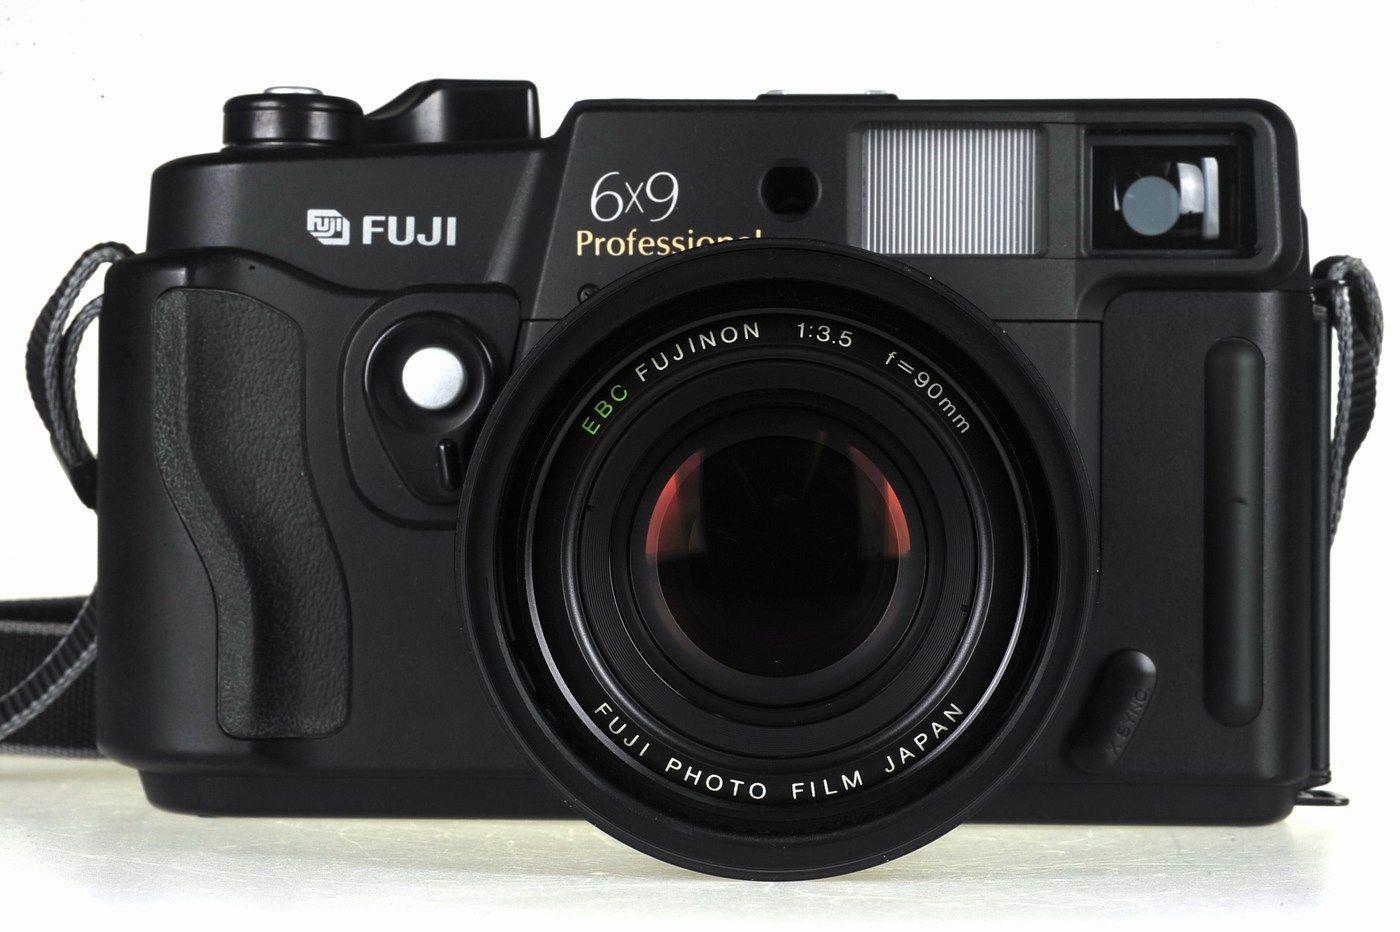 Fuji GW690III 6x9cm medium format rangefinder camera. HUGE negative ...